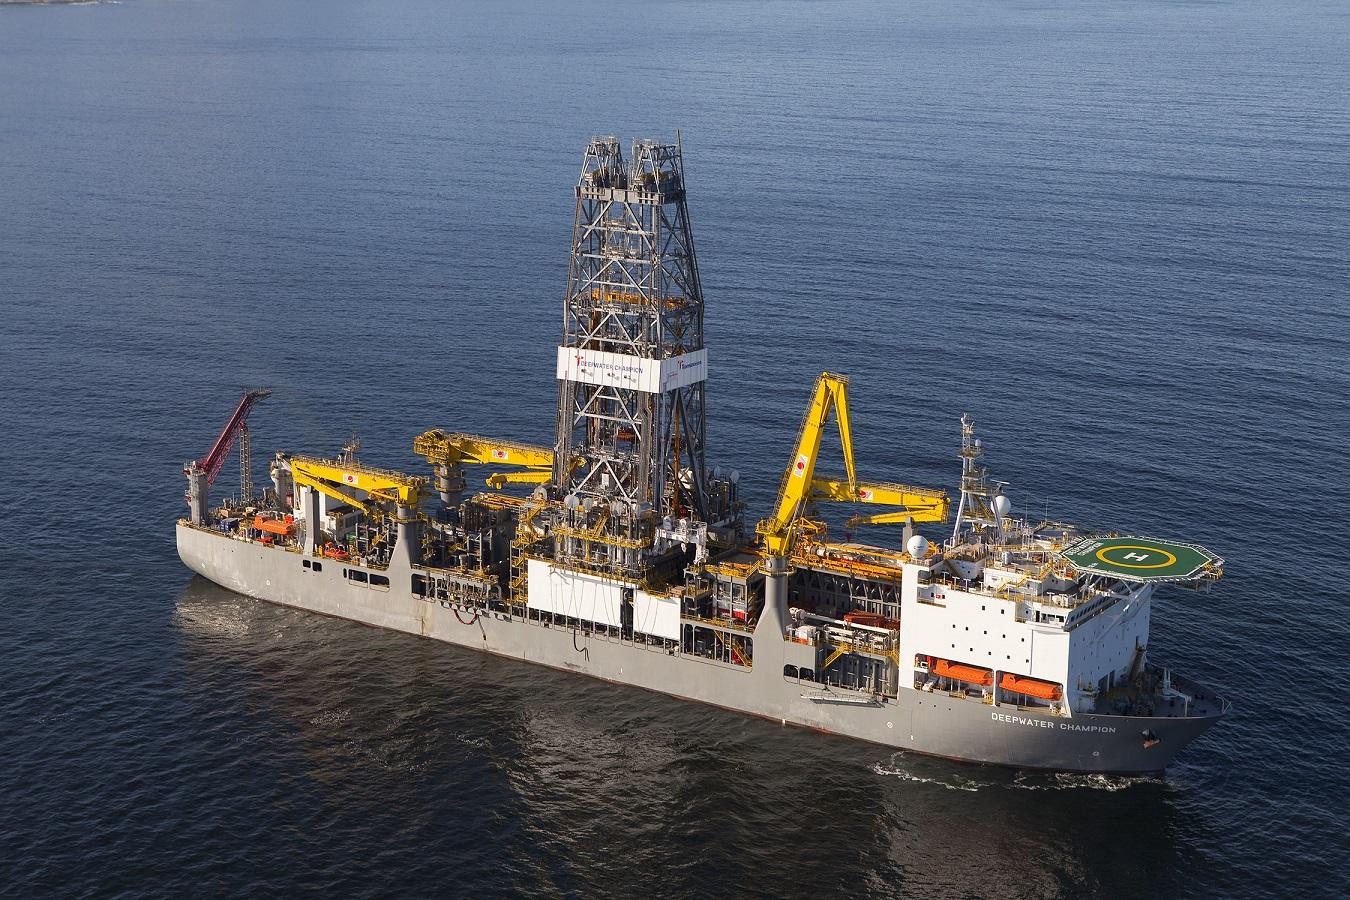 Transocean drilling rig.